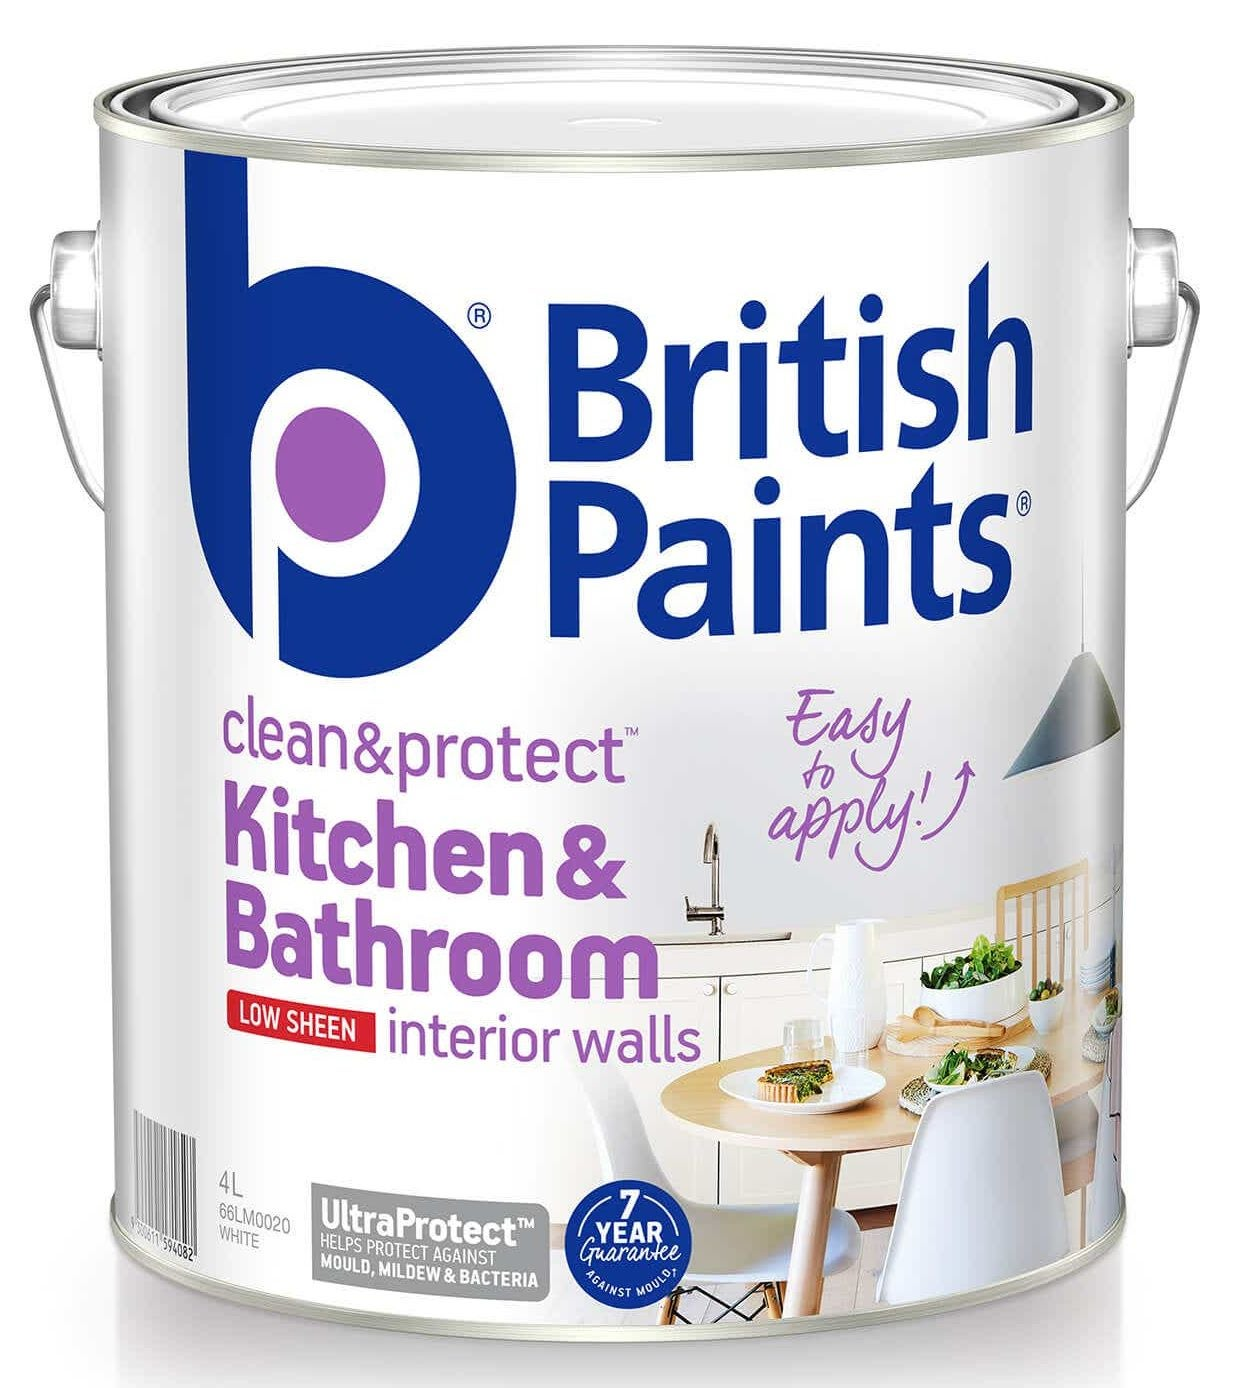 British Paint review